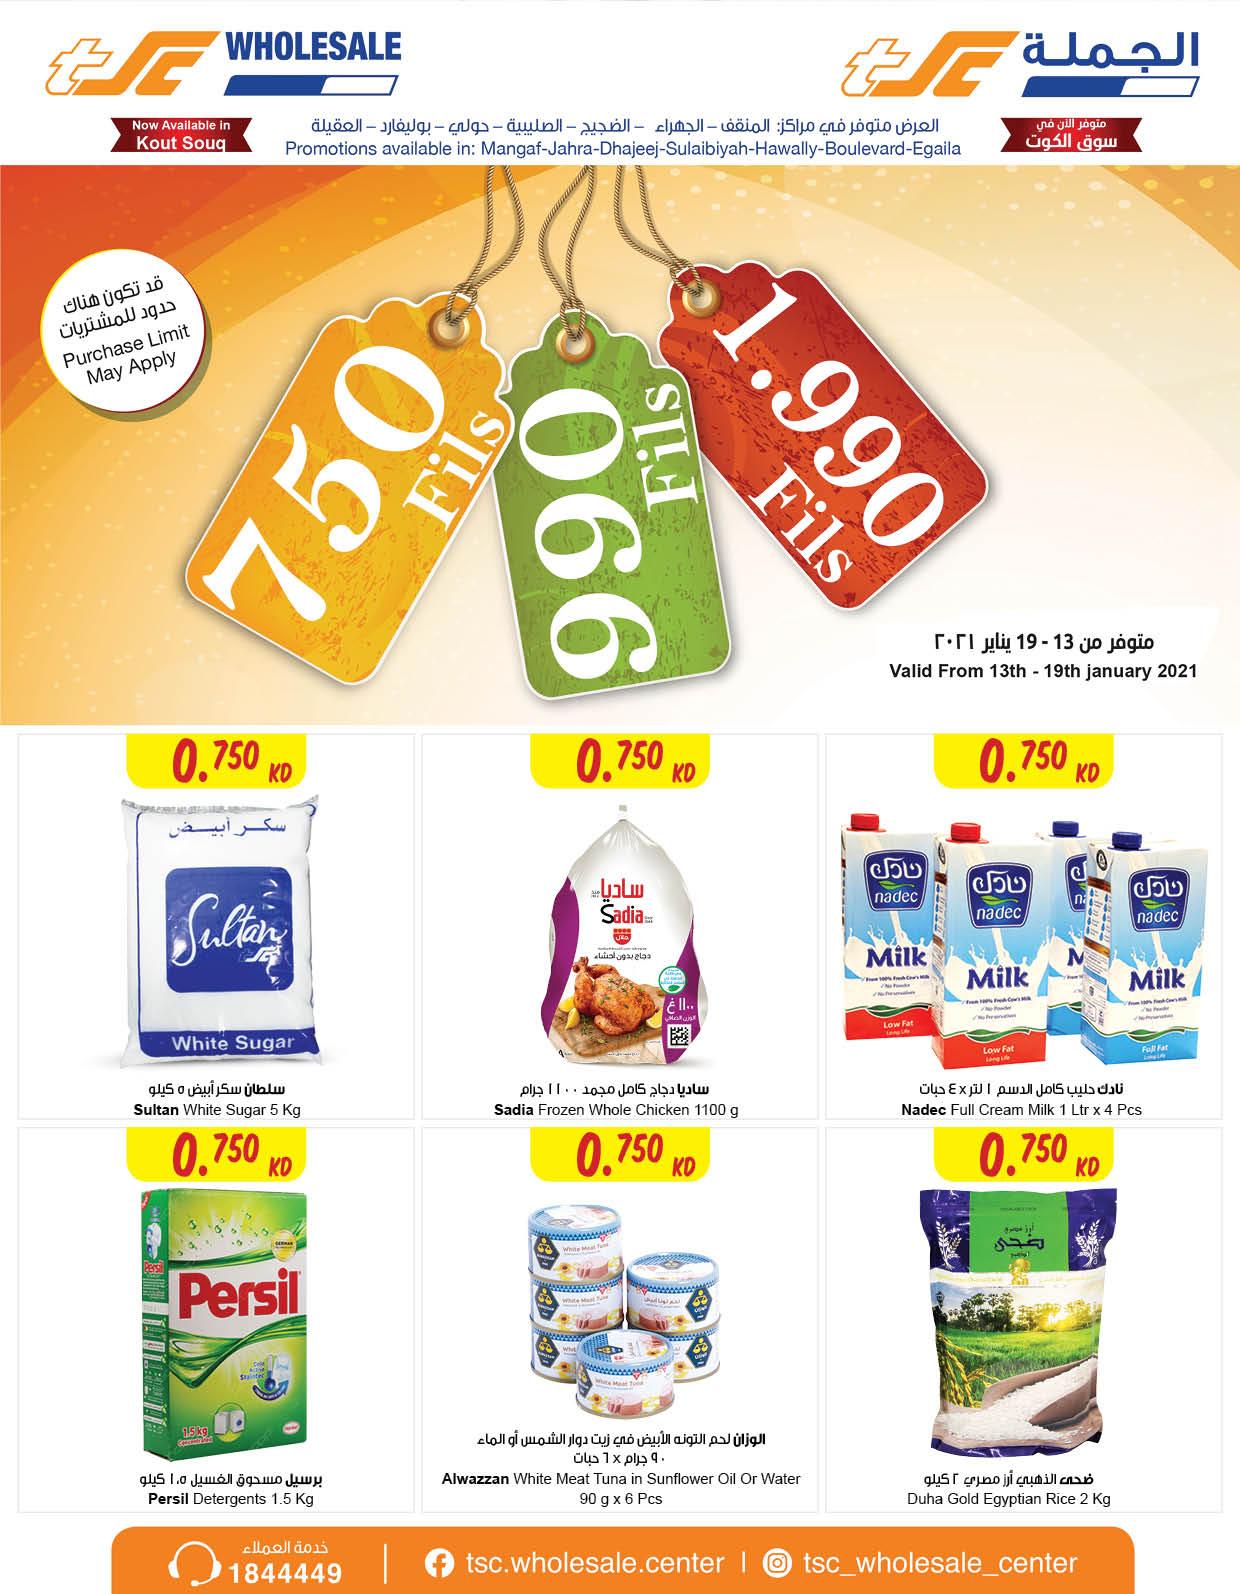 Sultan Center Weekly promotions, iiQ8, Deals in Sultan Centre Kuwait Jan 2021 1